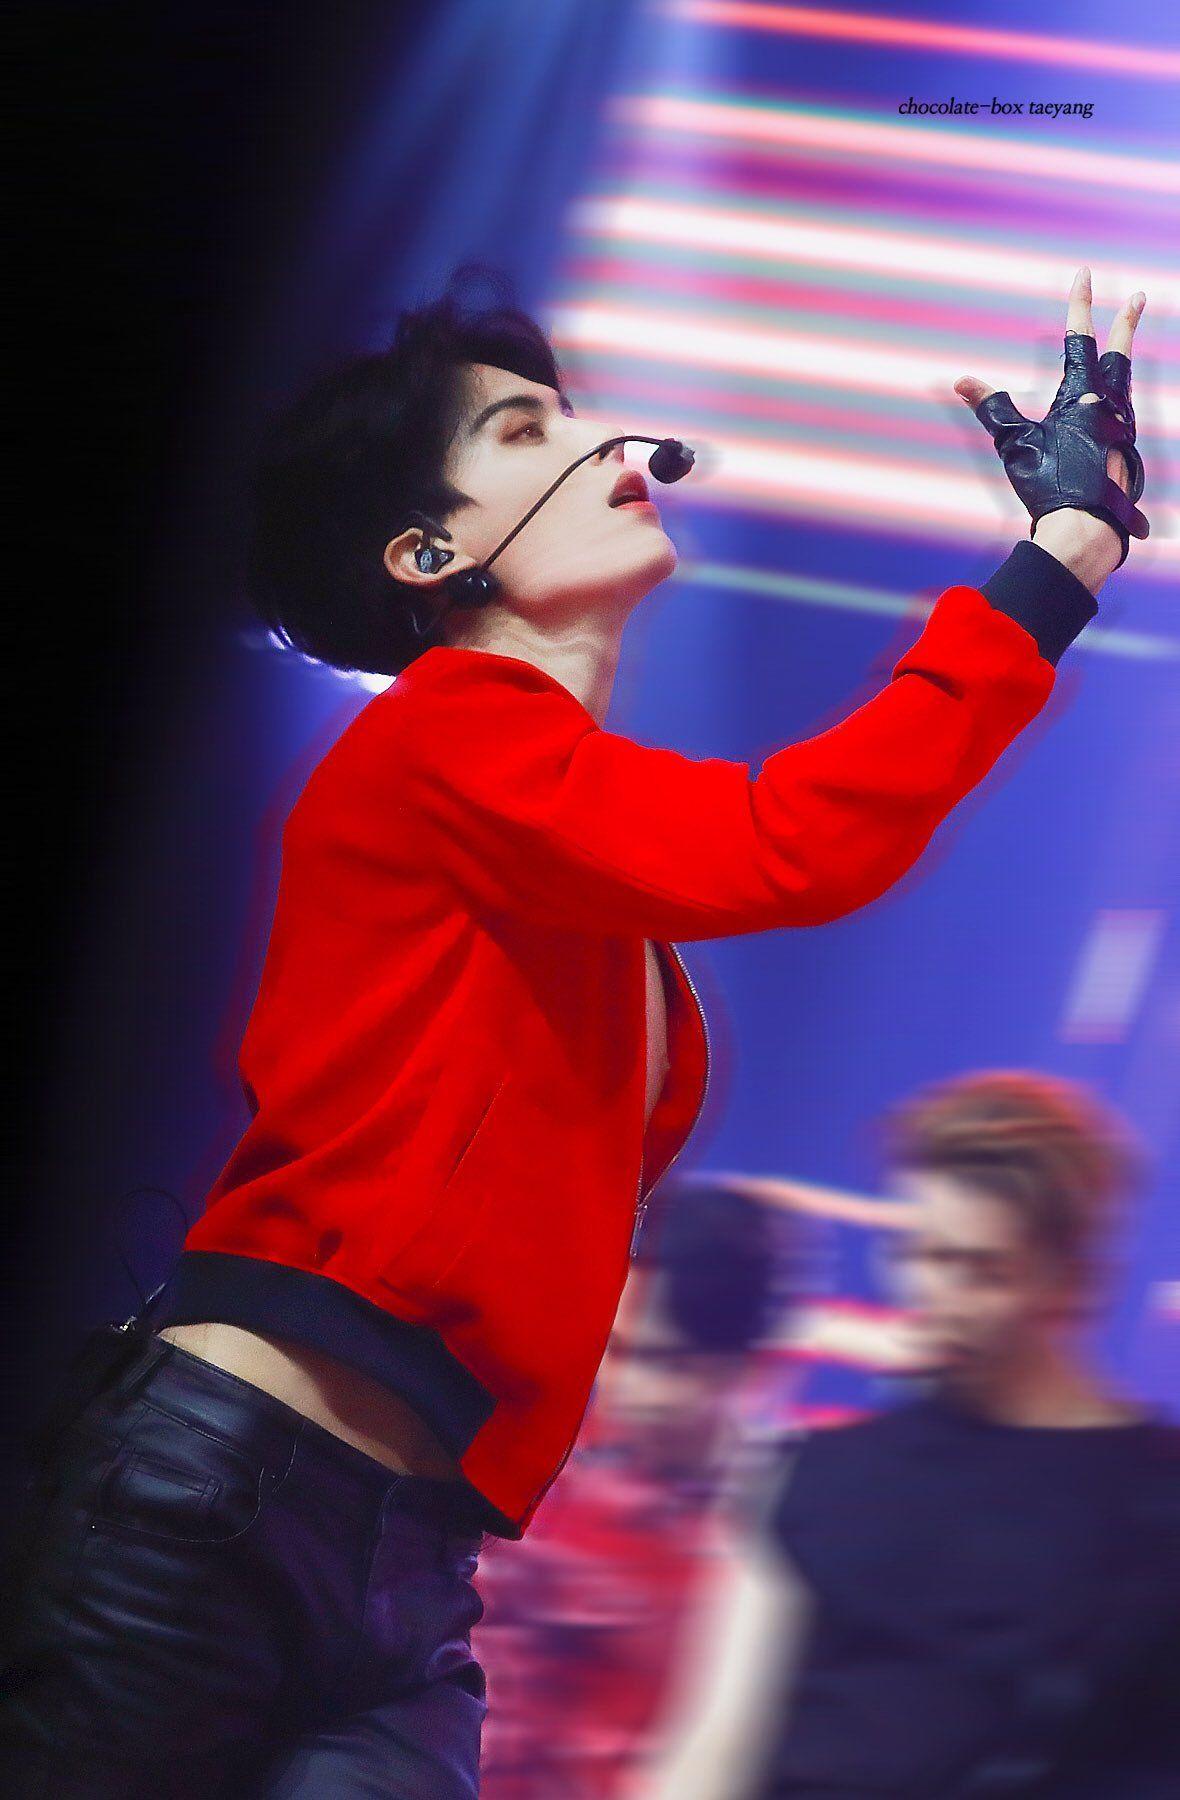 190828 Idol Live Ilog U Concert Cr Chocolate Box Do Not Edit Sf9 Taeyang Sf9 Taeyang